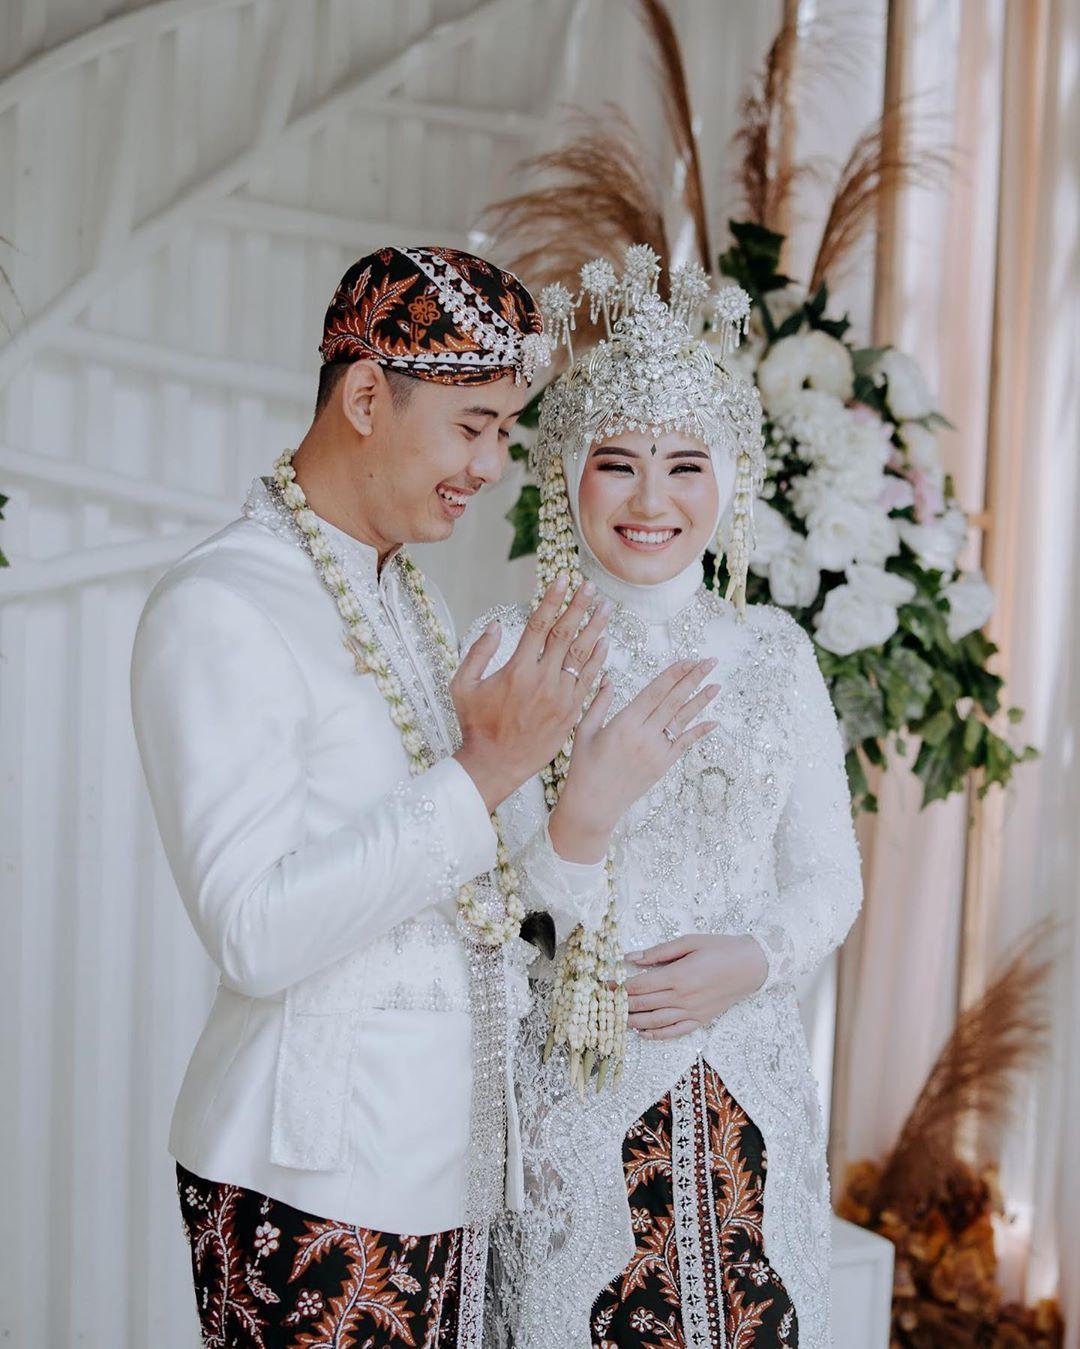 Prosesi Pernikahan Adat Sunda yang Menginspirasi - idewedding